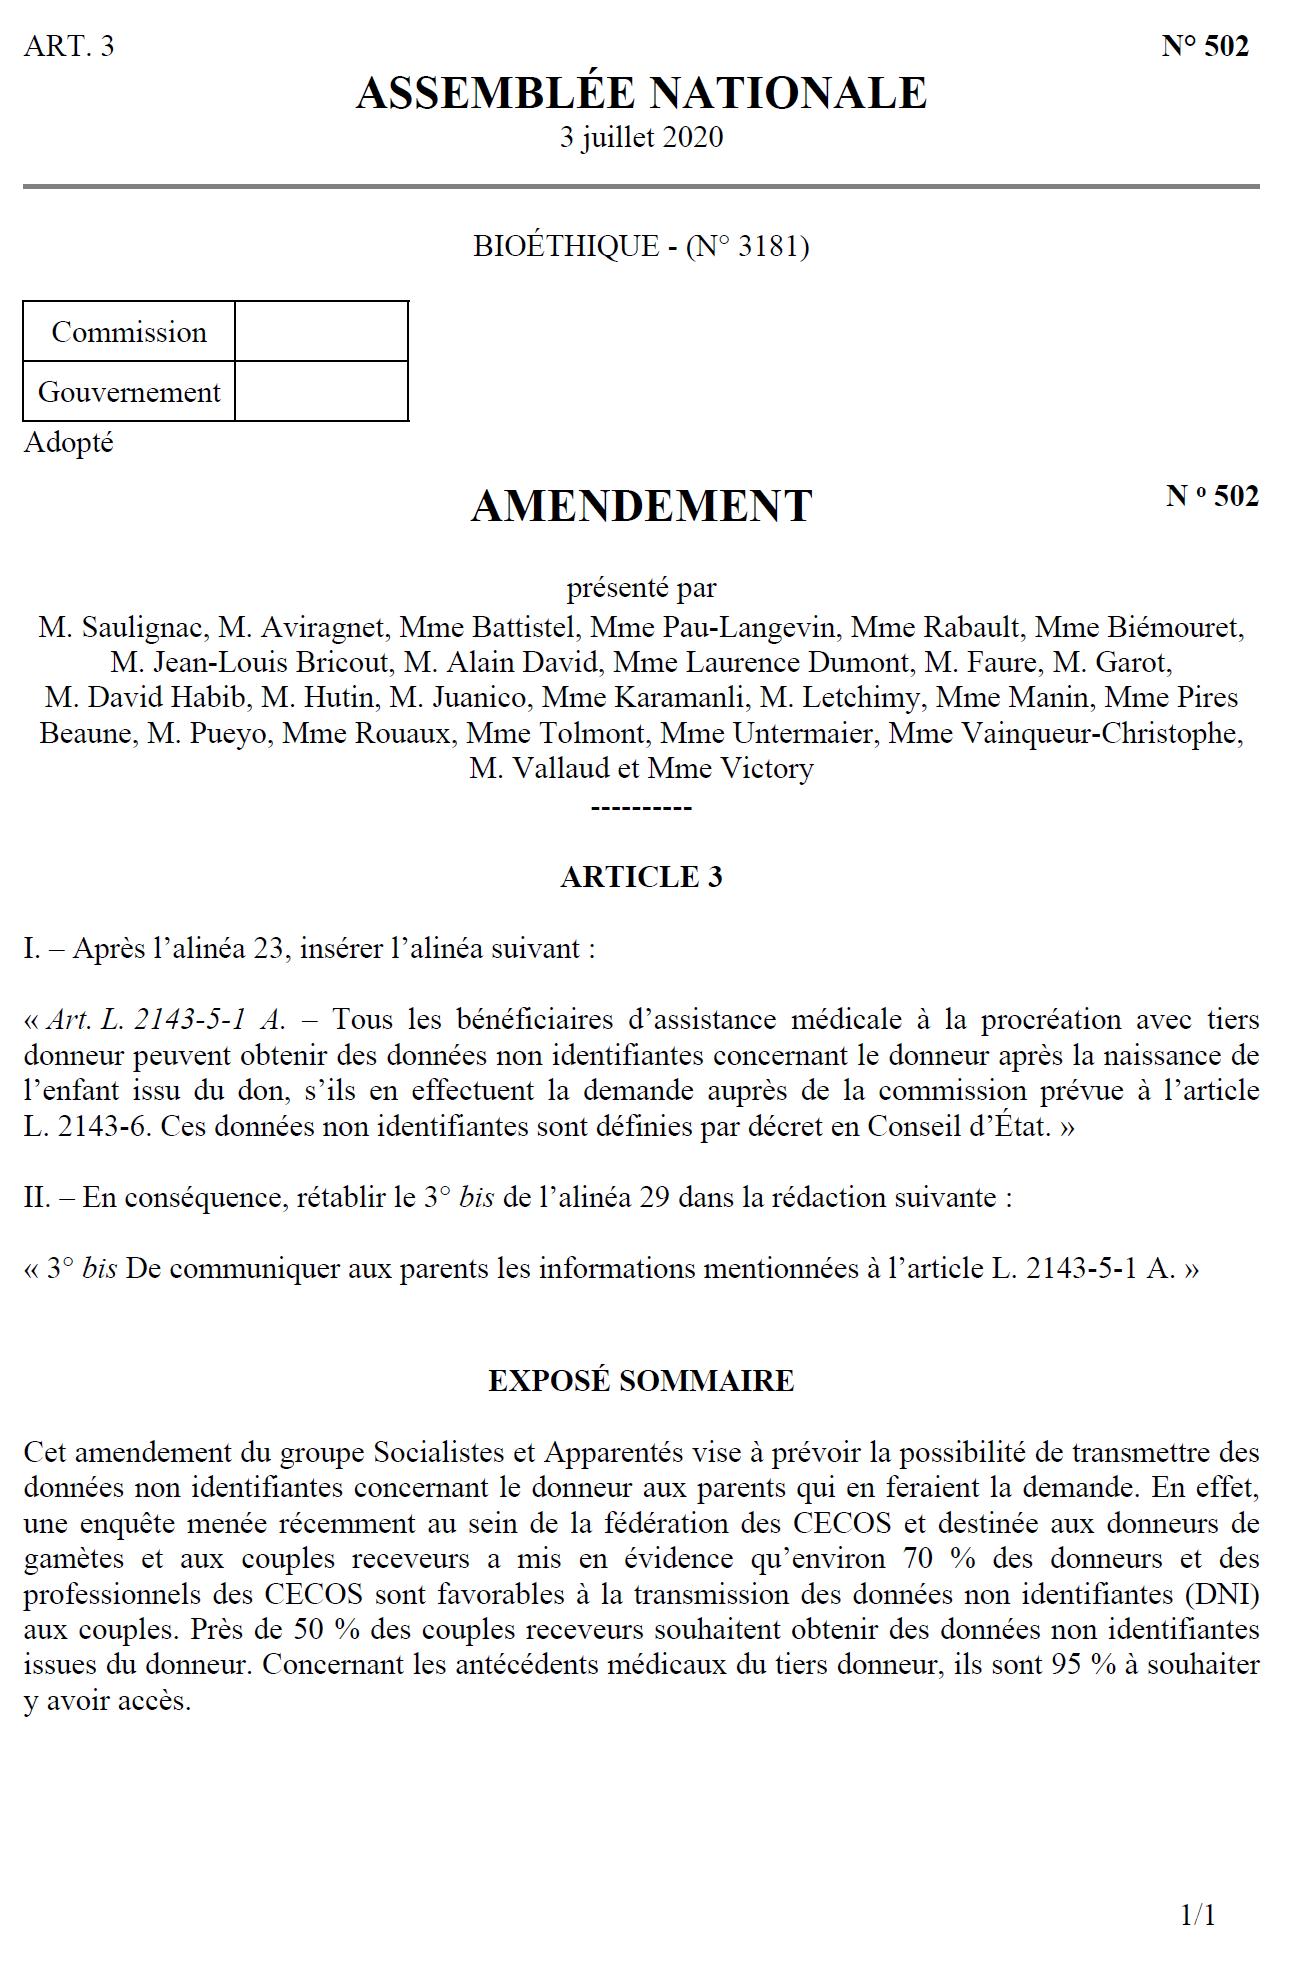 Amendement 502